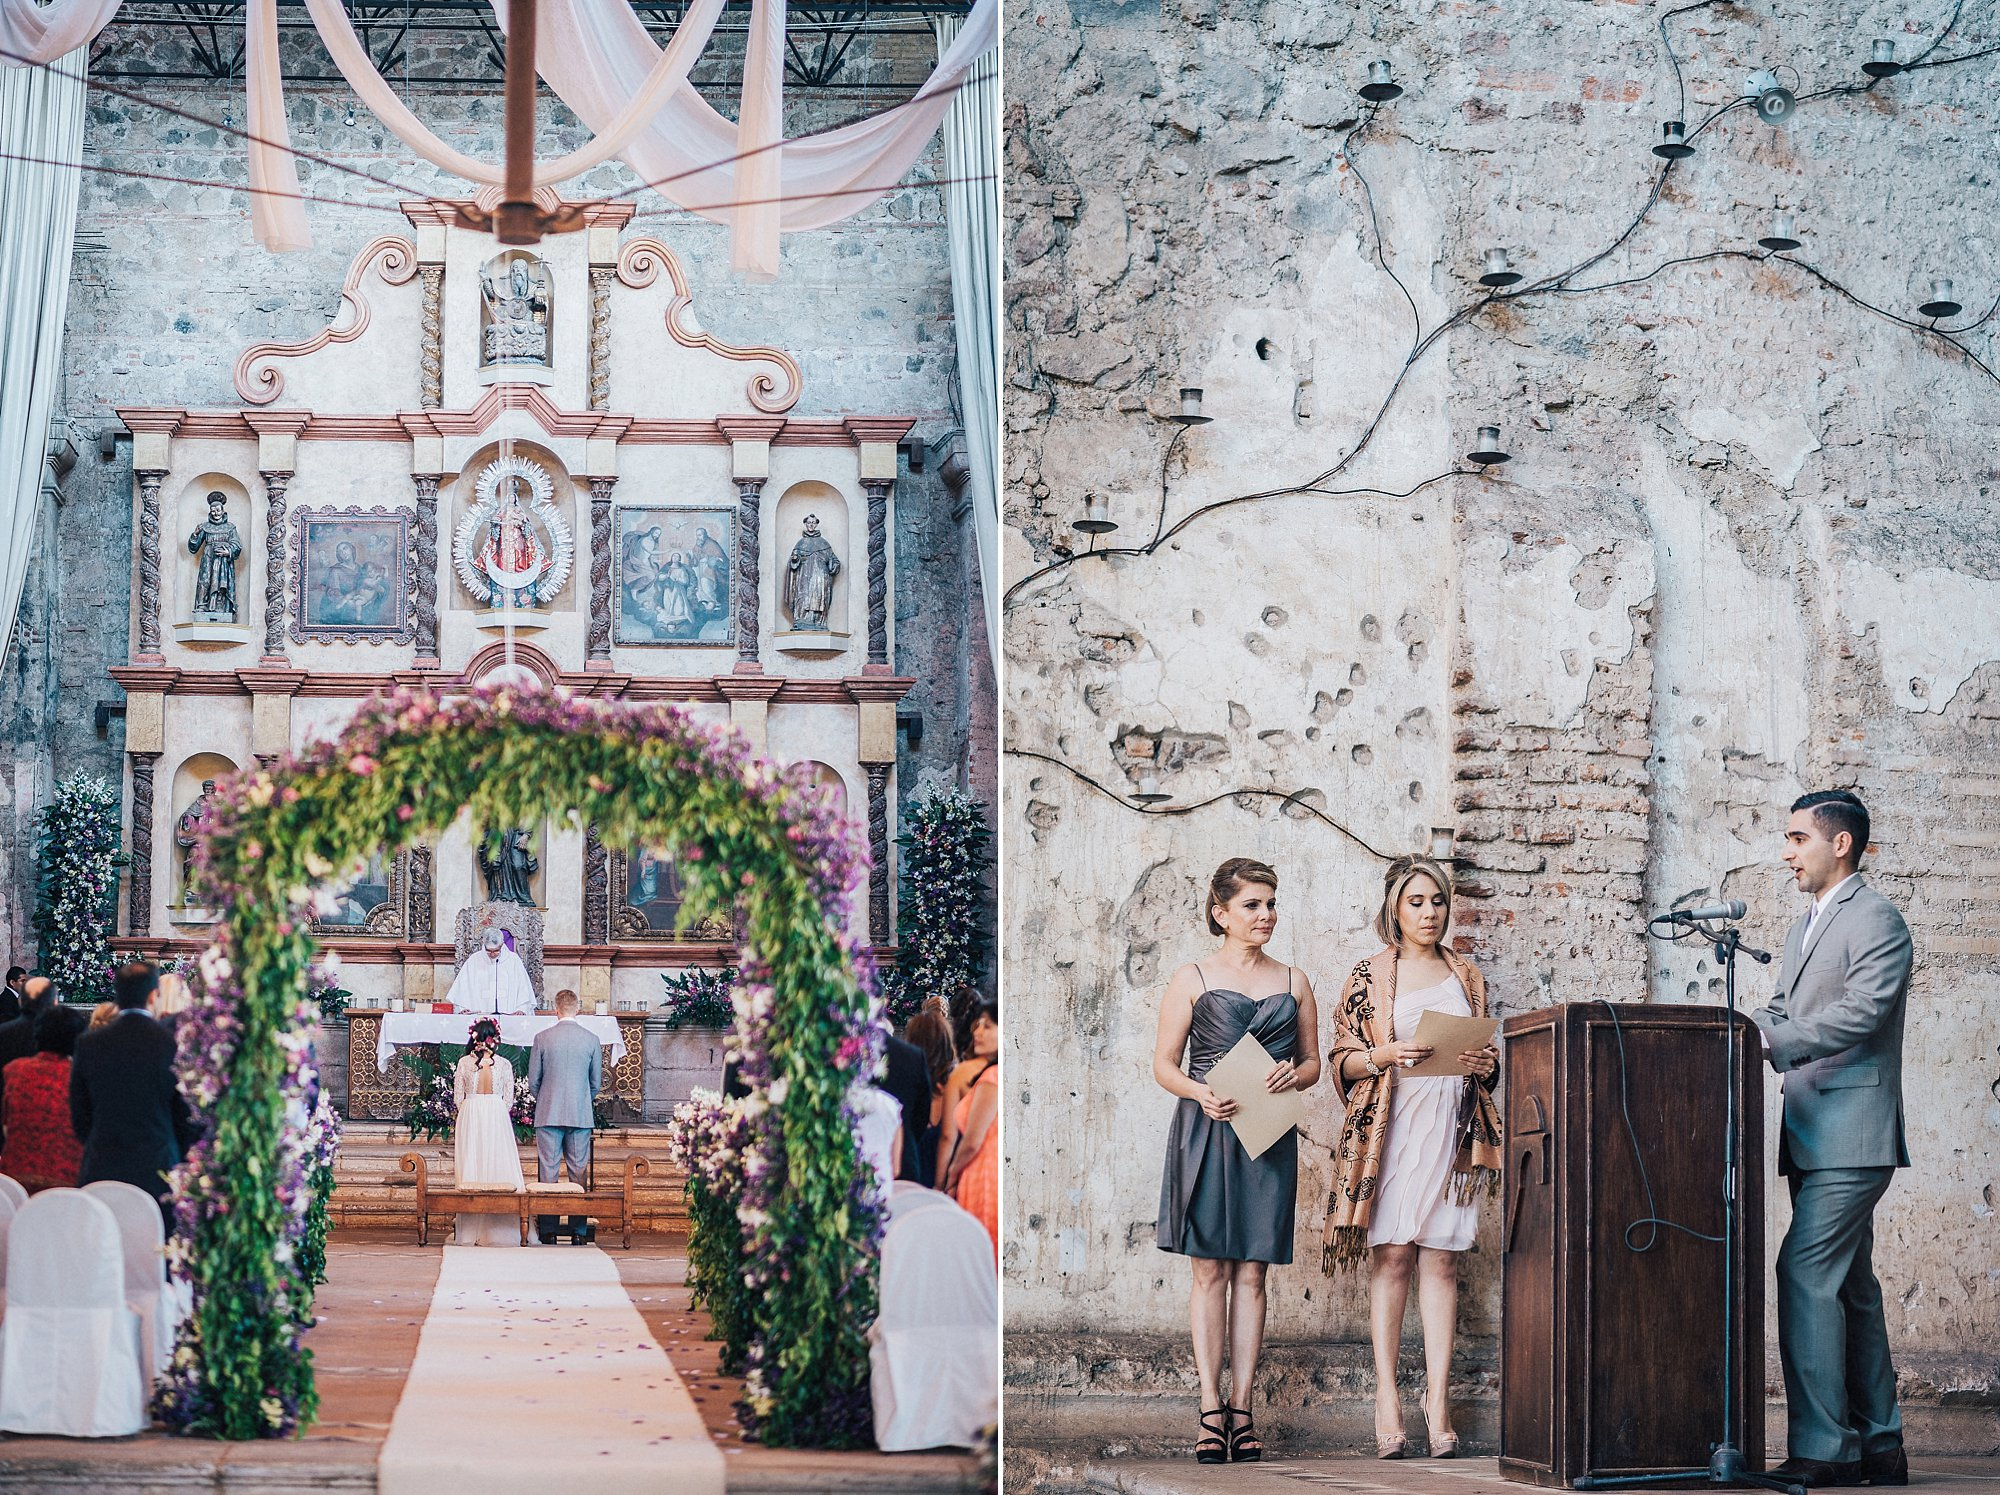 alex-yazmin-wedding-photographer-antigua-guatemala-072